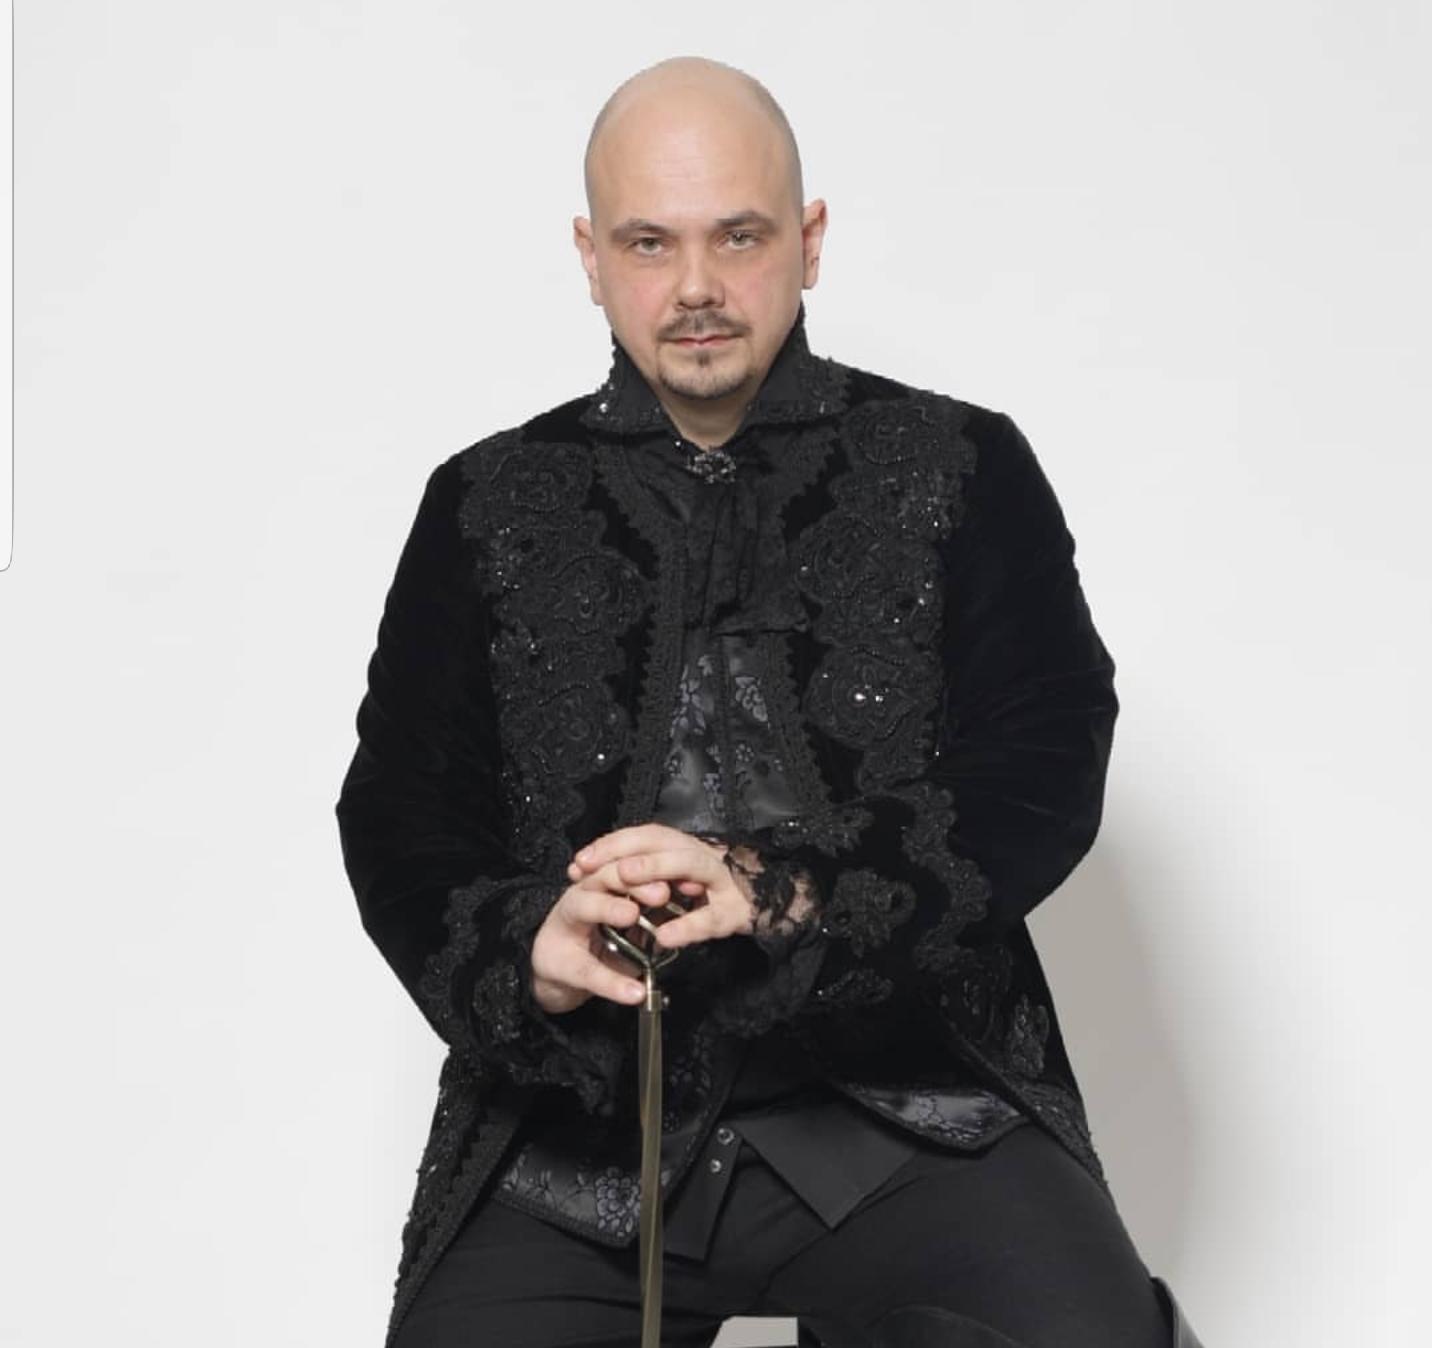 Игорь, автор колоды Greator fatum, МАГ, психоаналитик. Краснодар